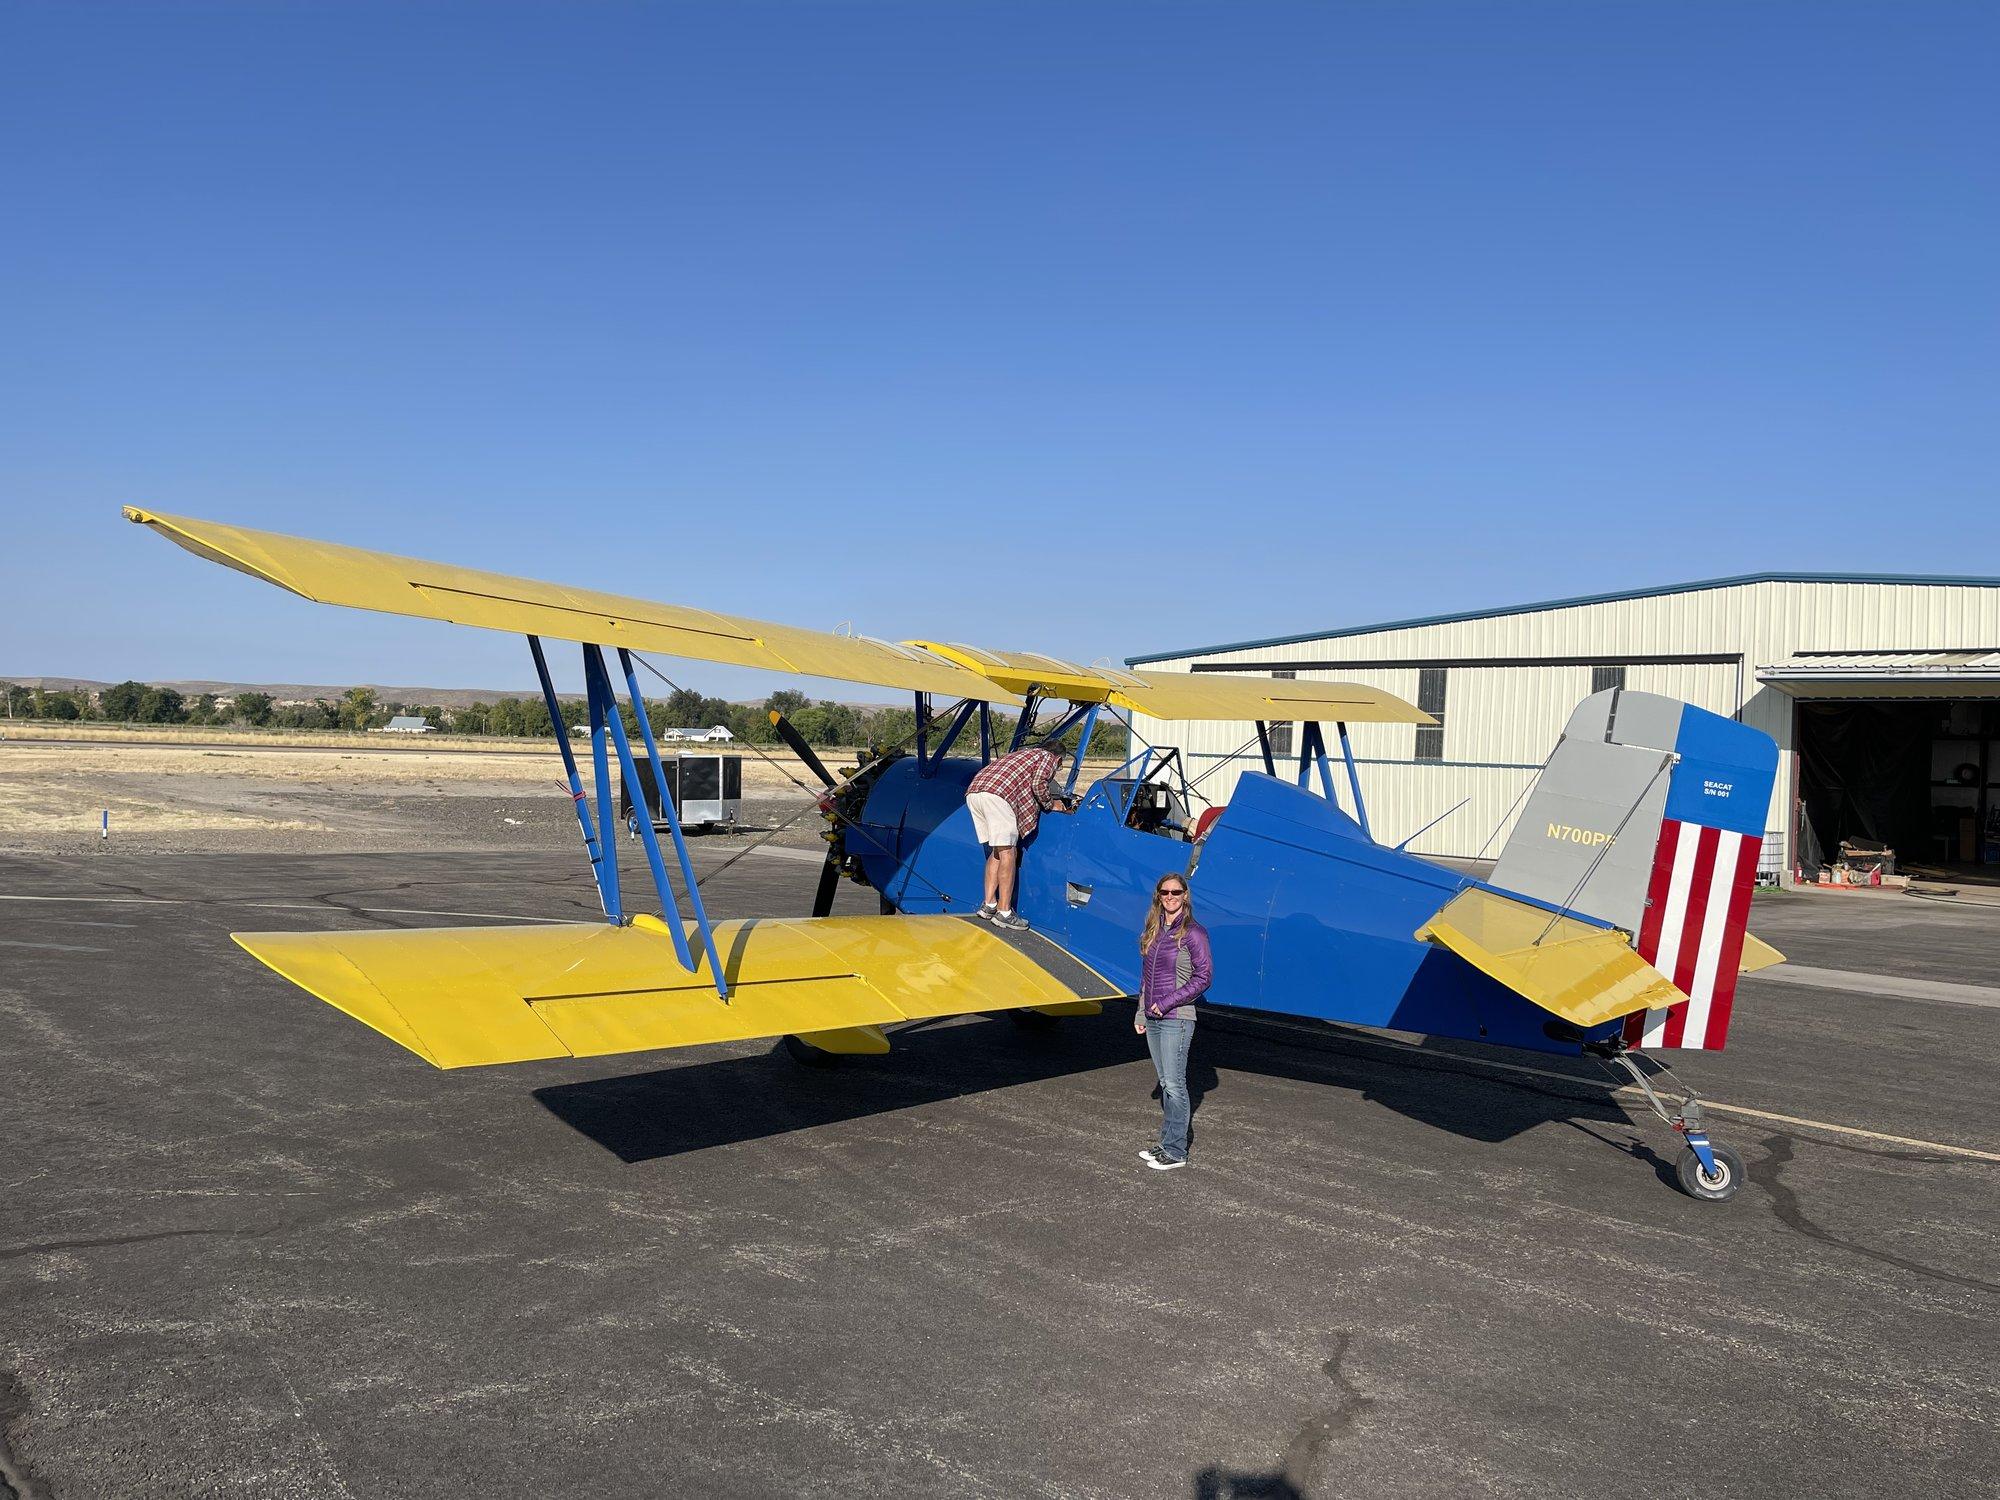 68F57305-7642-4595-8328-FAA2DE636756.jpeg